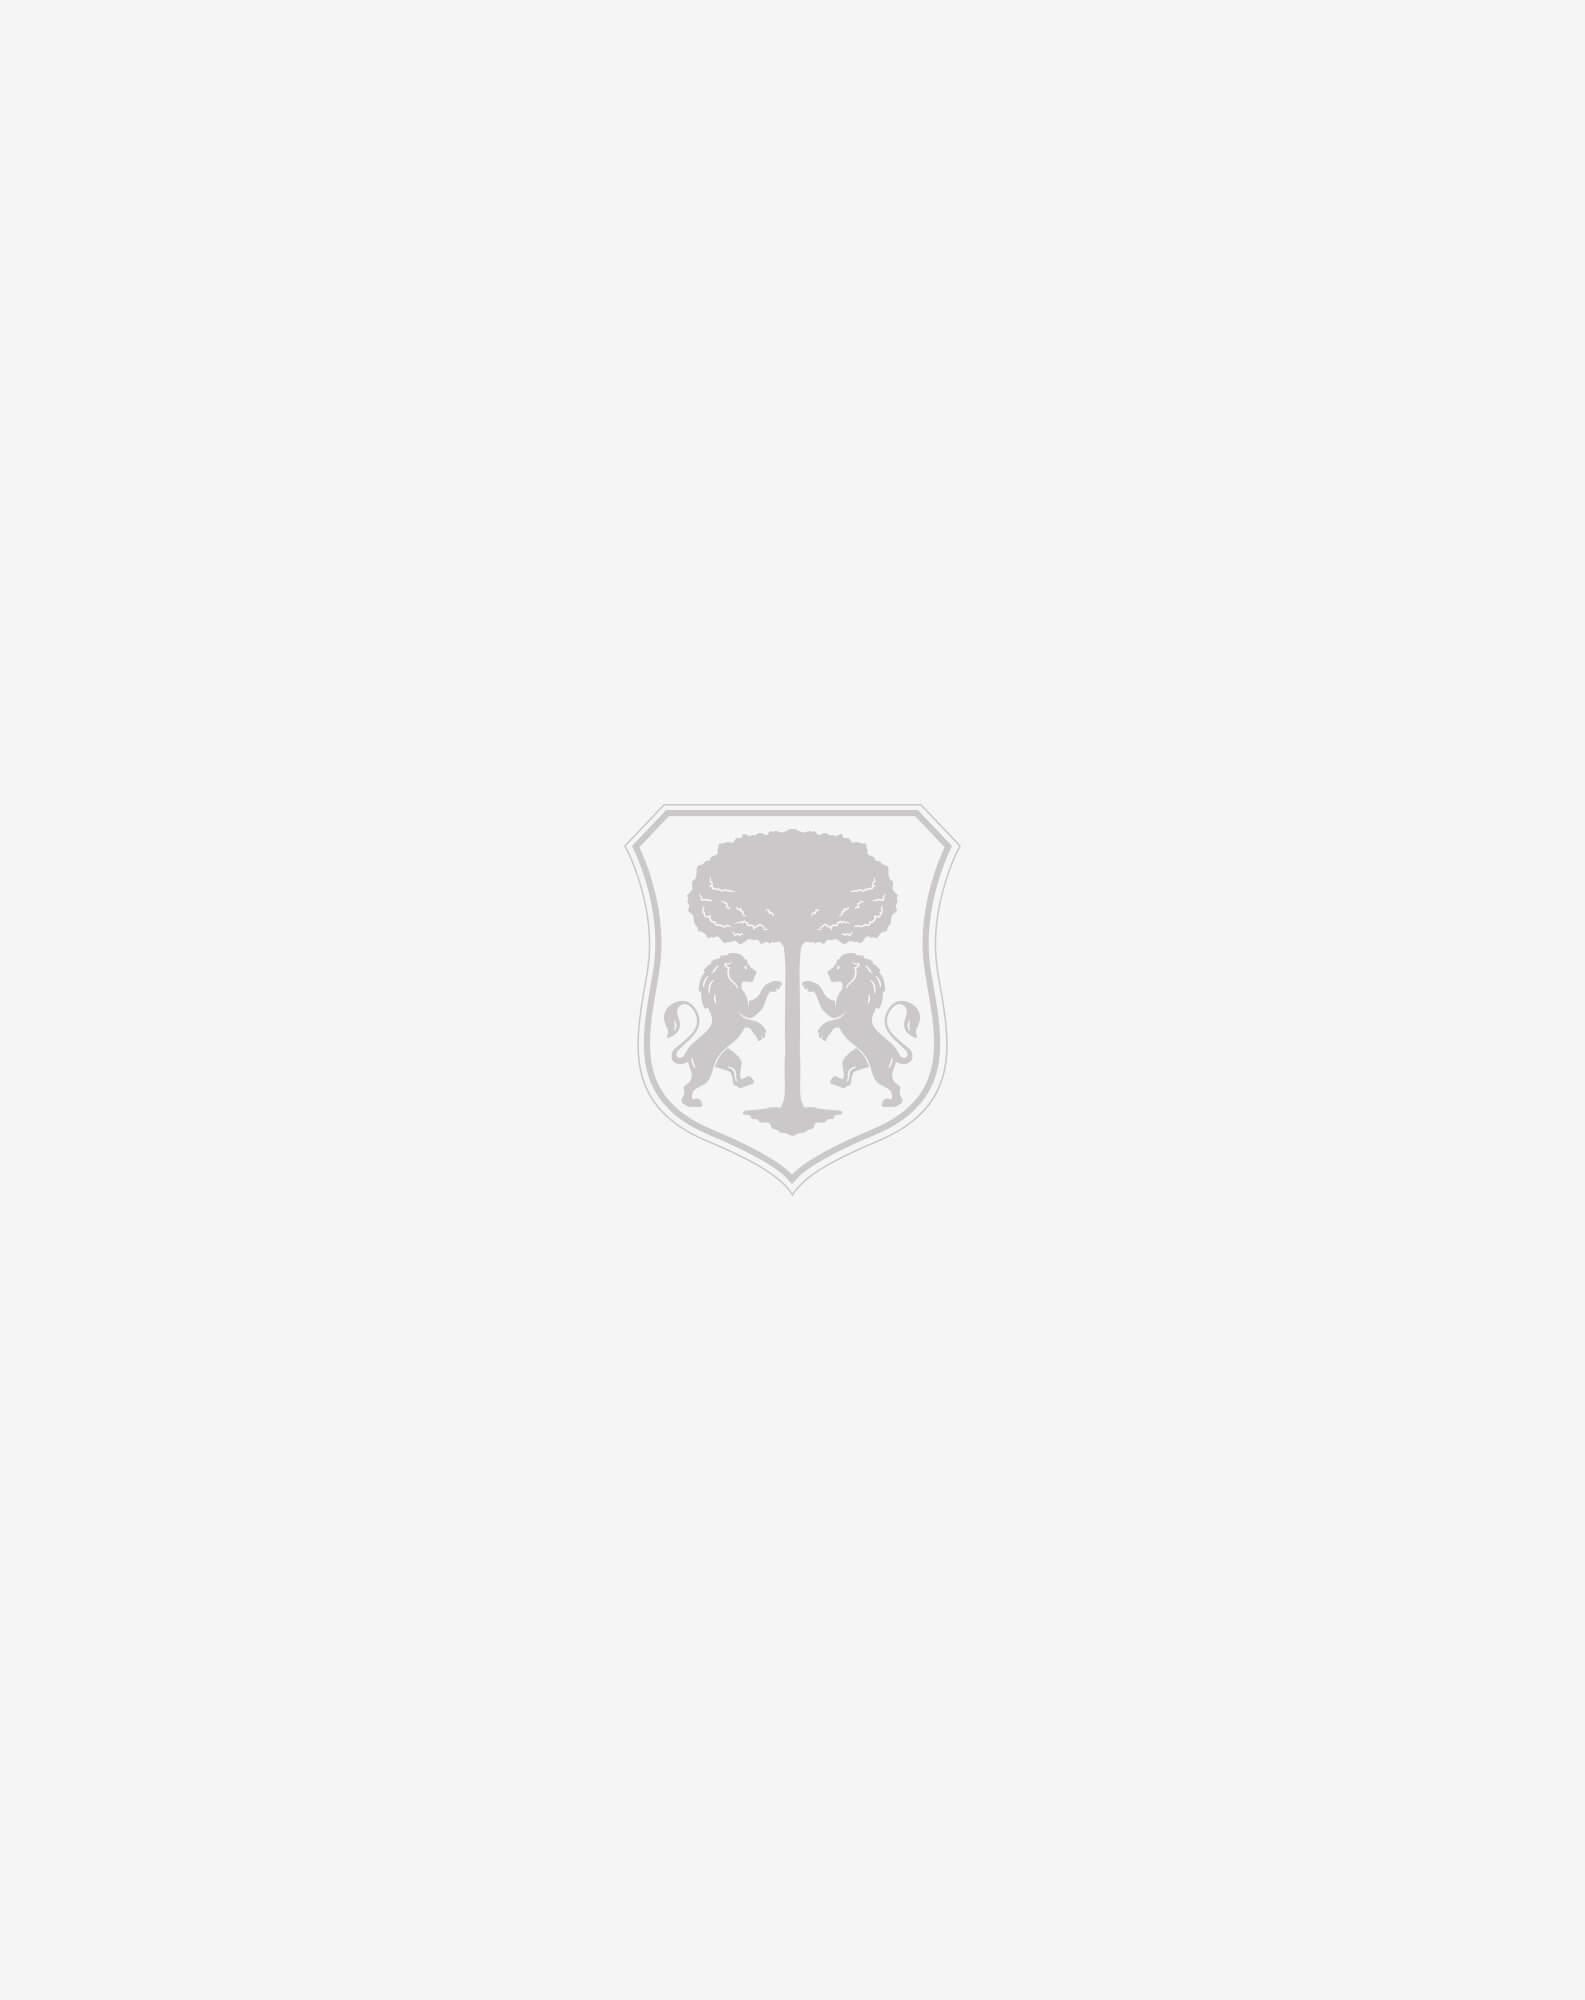 Style&Freedom full-zip sweater